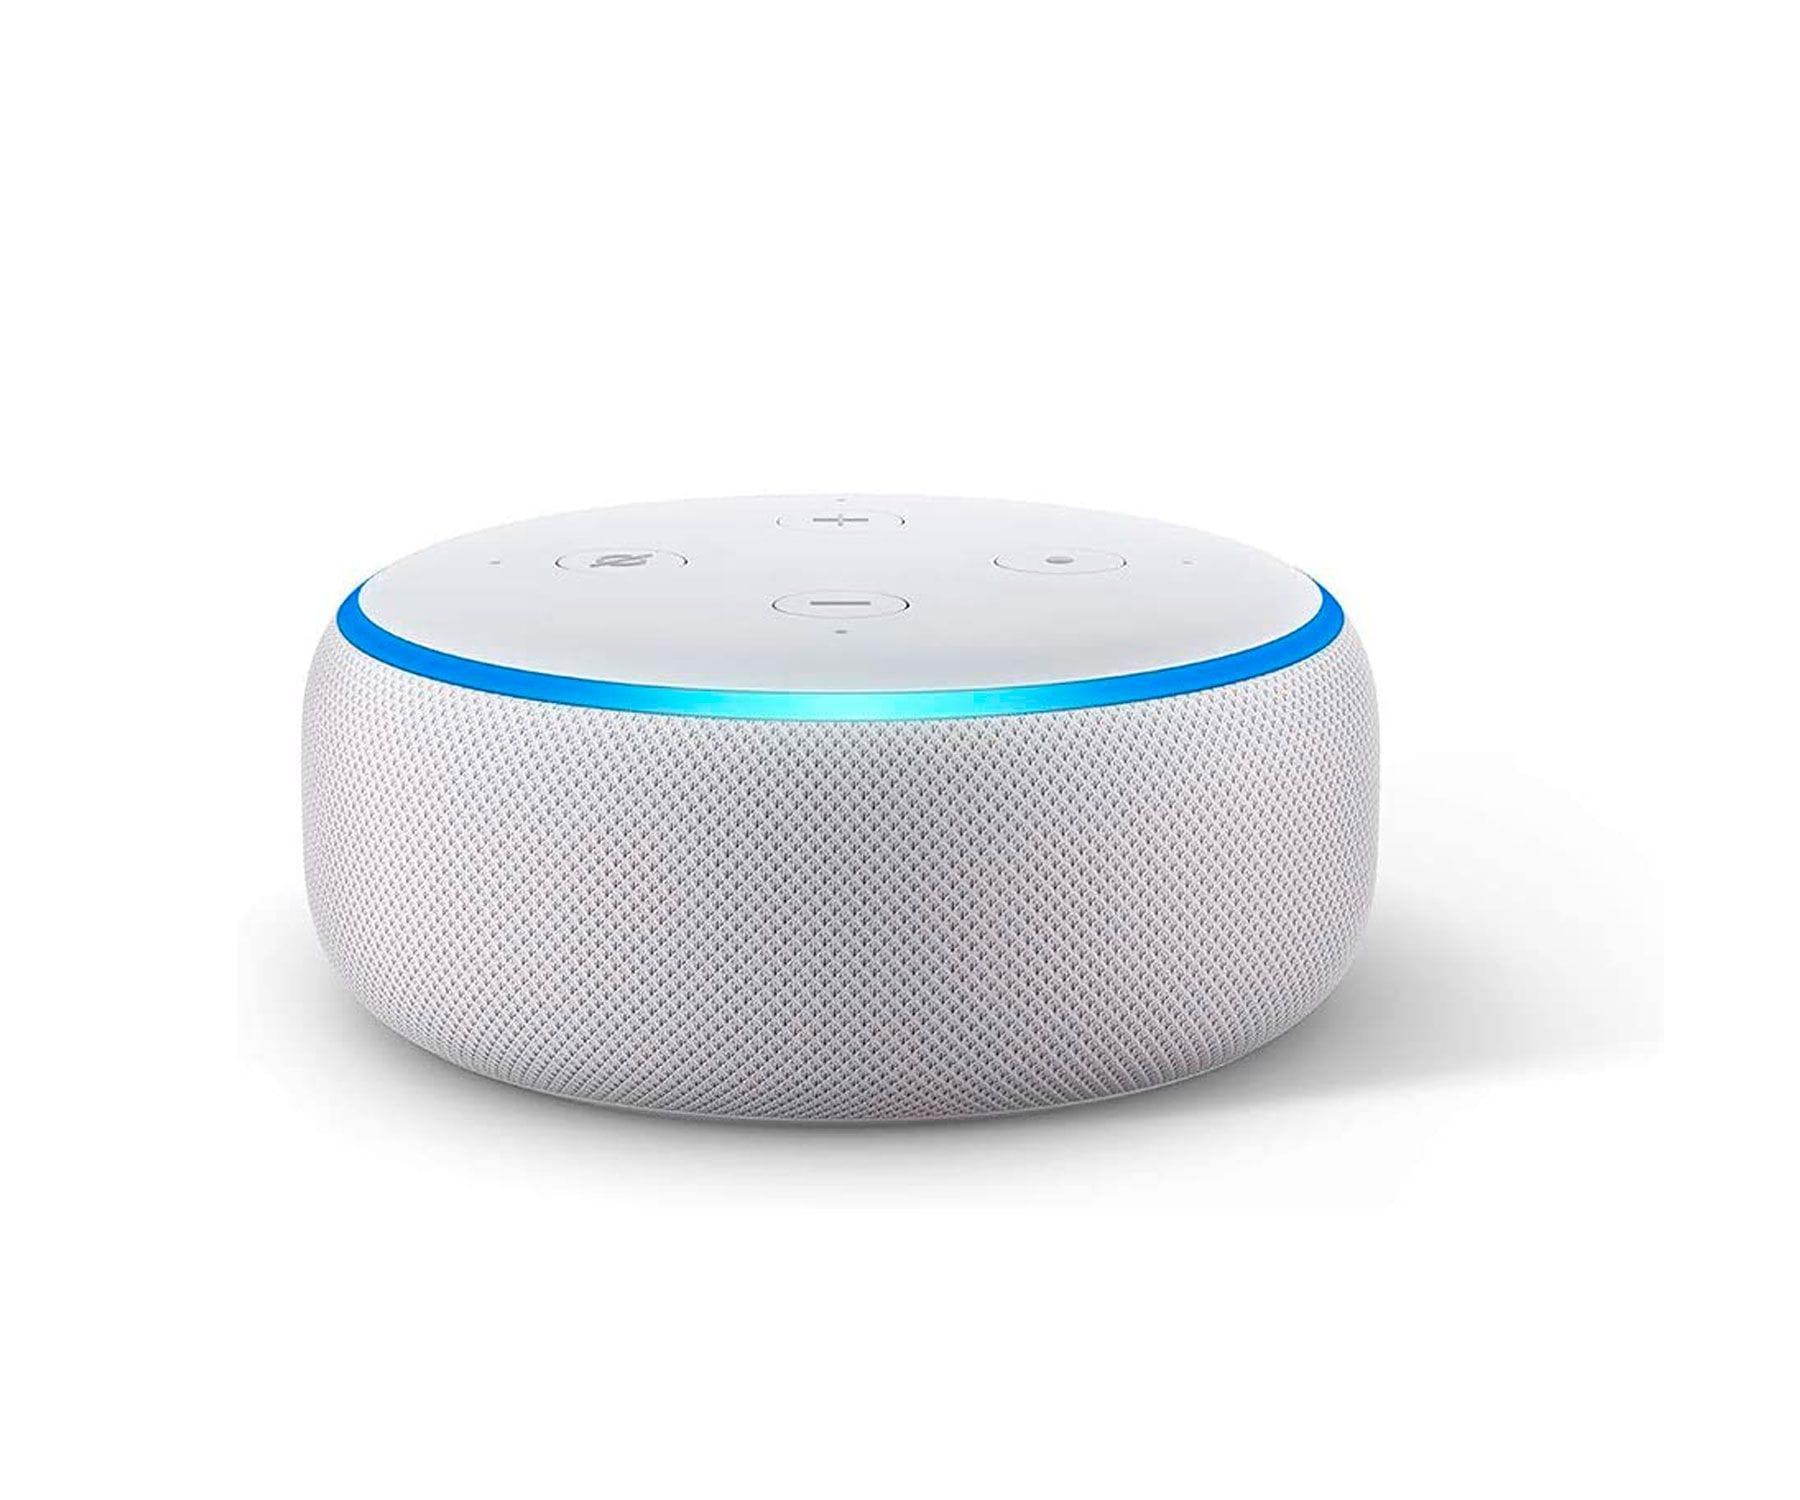 Amazon Altavoz Echo Dot Blanco 3ª generación/Control hogar inteligente/Alexa